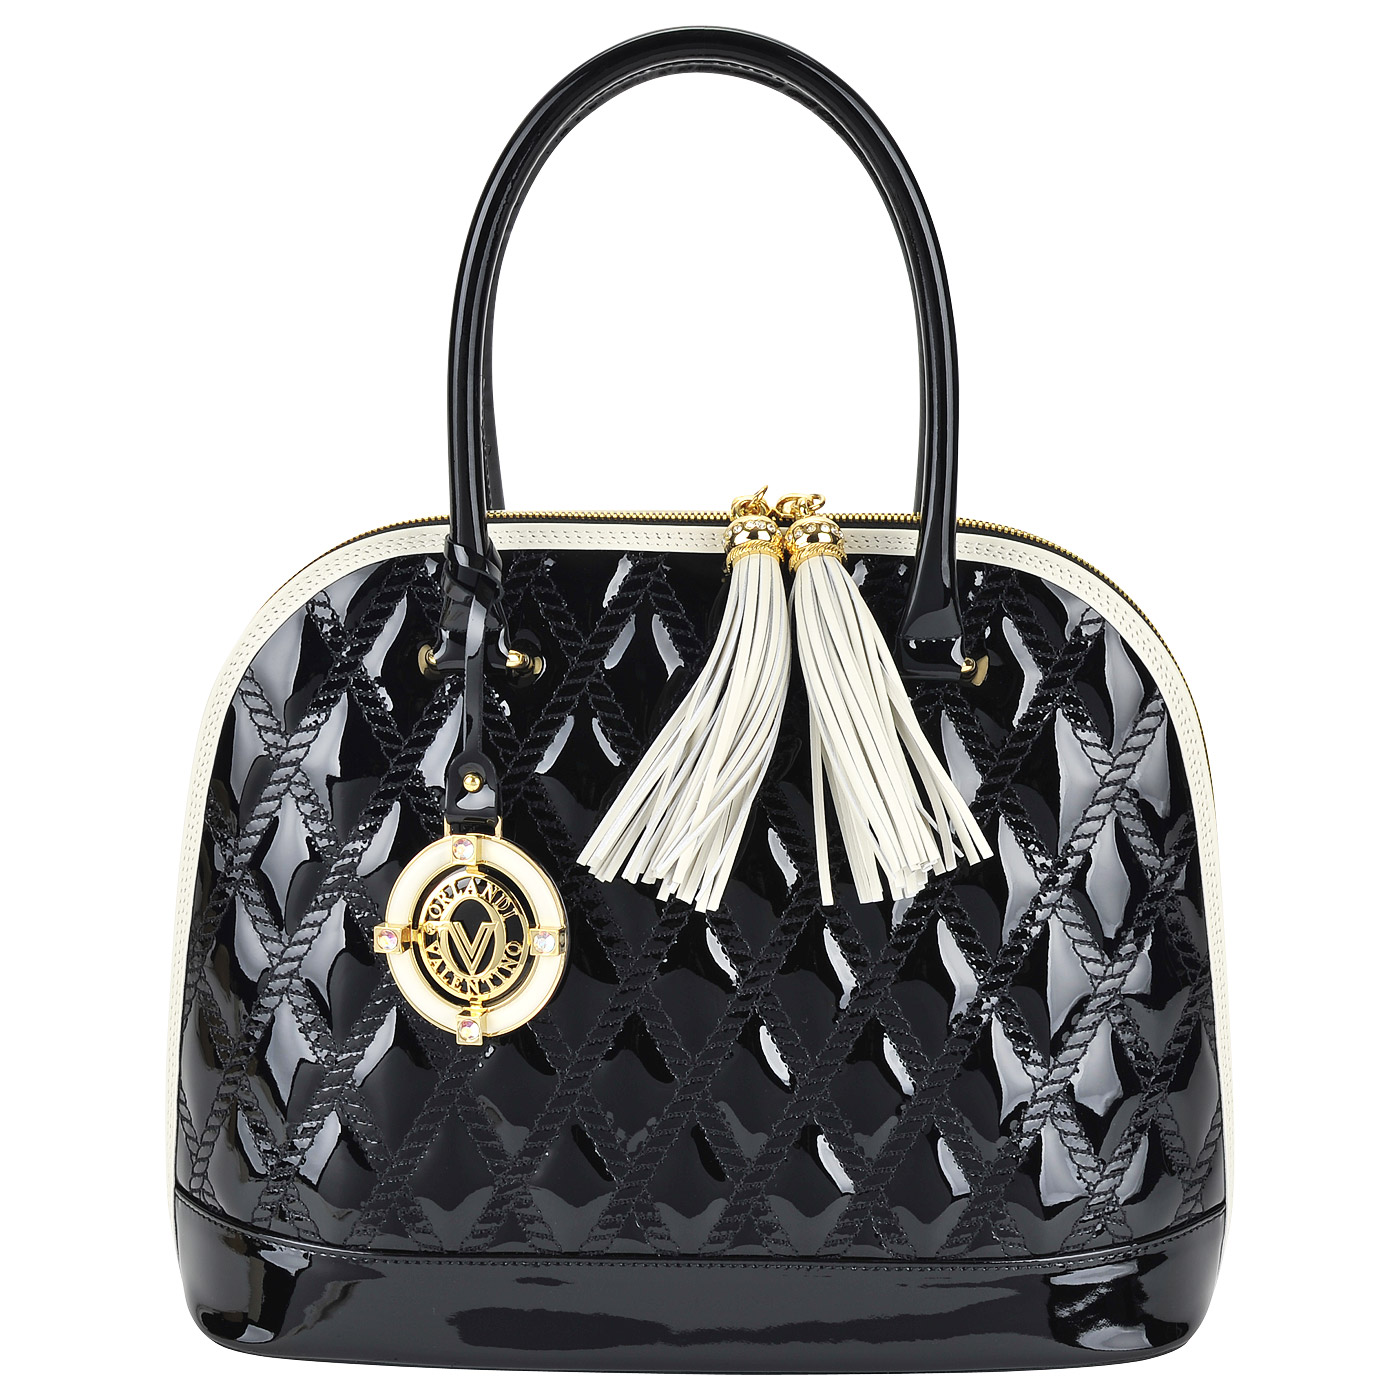 aa0e15b60e47 Женская черная лаковая сумка со светлой окантовкой Valentino Orlandi Ilary  ...